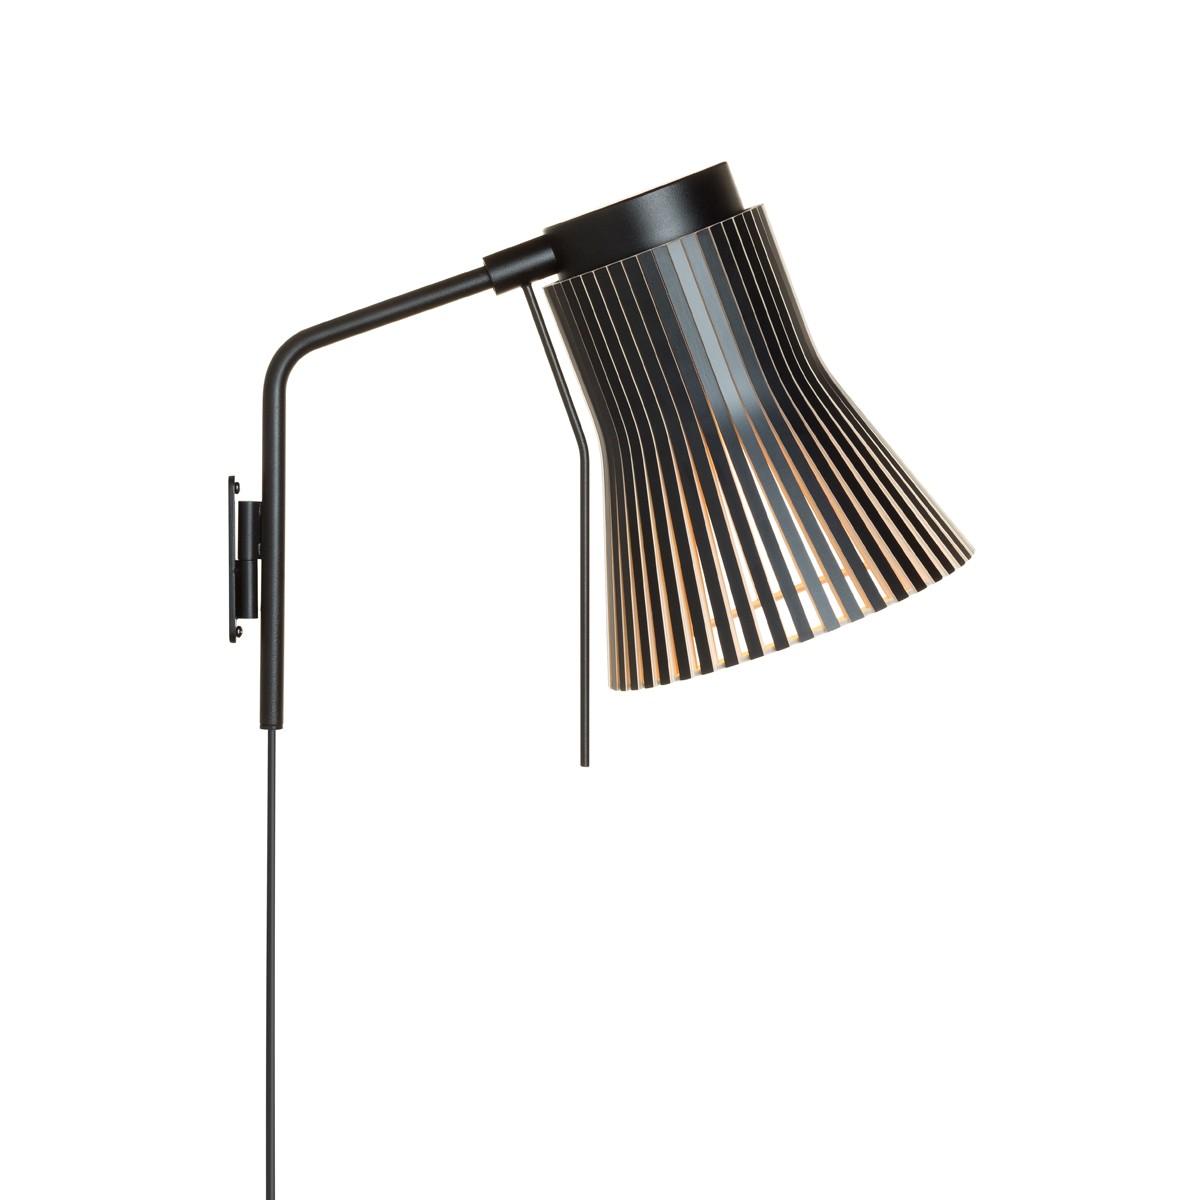 Secto Design Petite 4630 Wandleuchte, schwarz, Schirm: schwarz laminiert